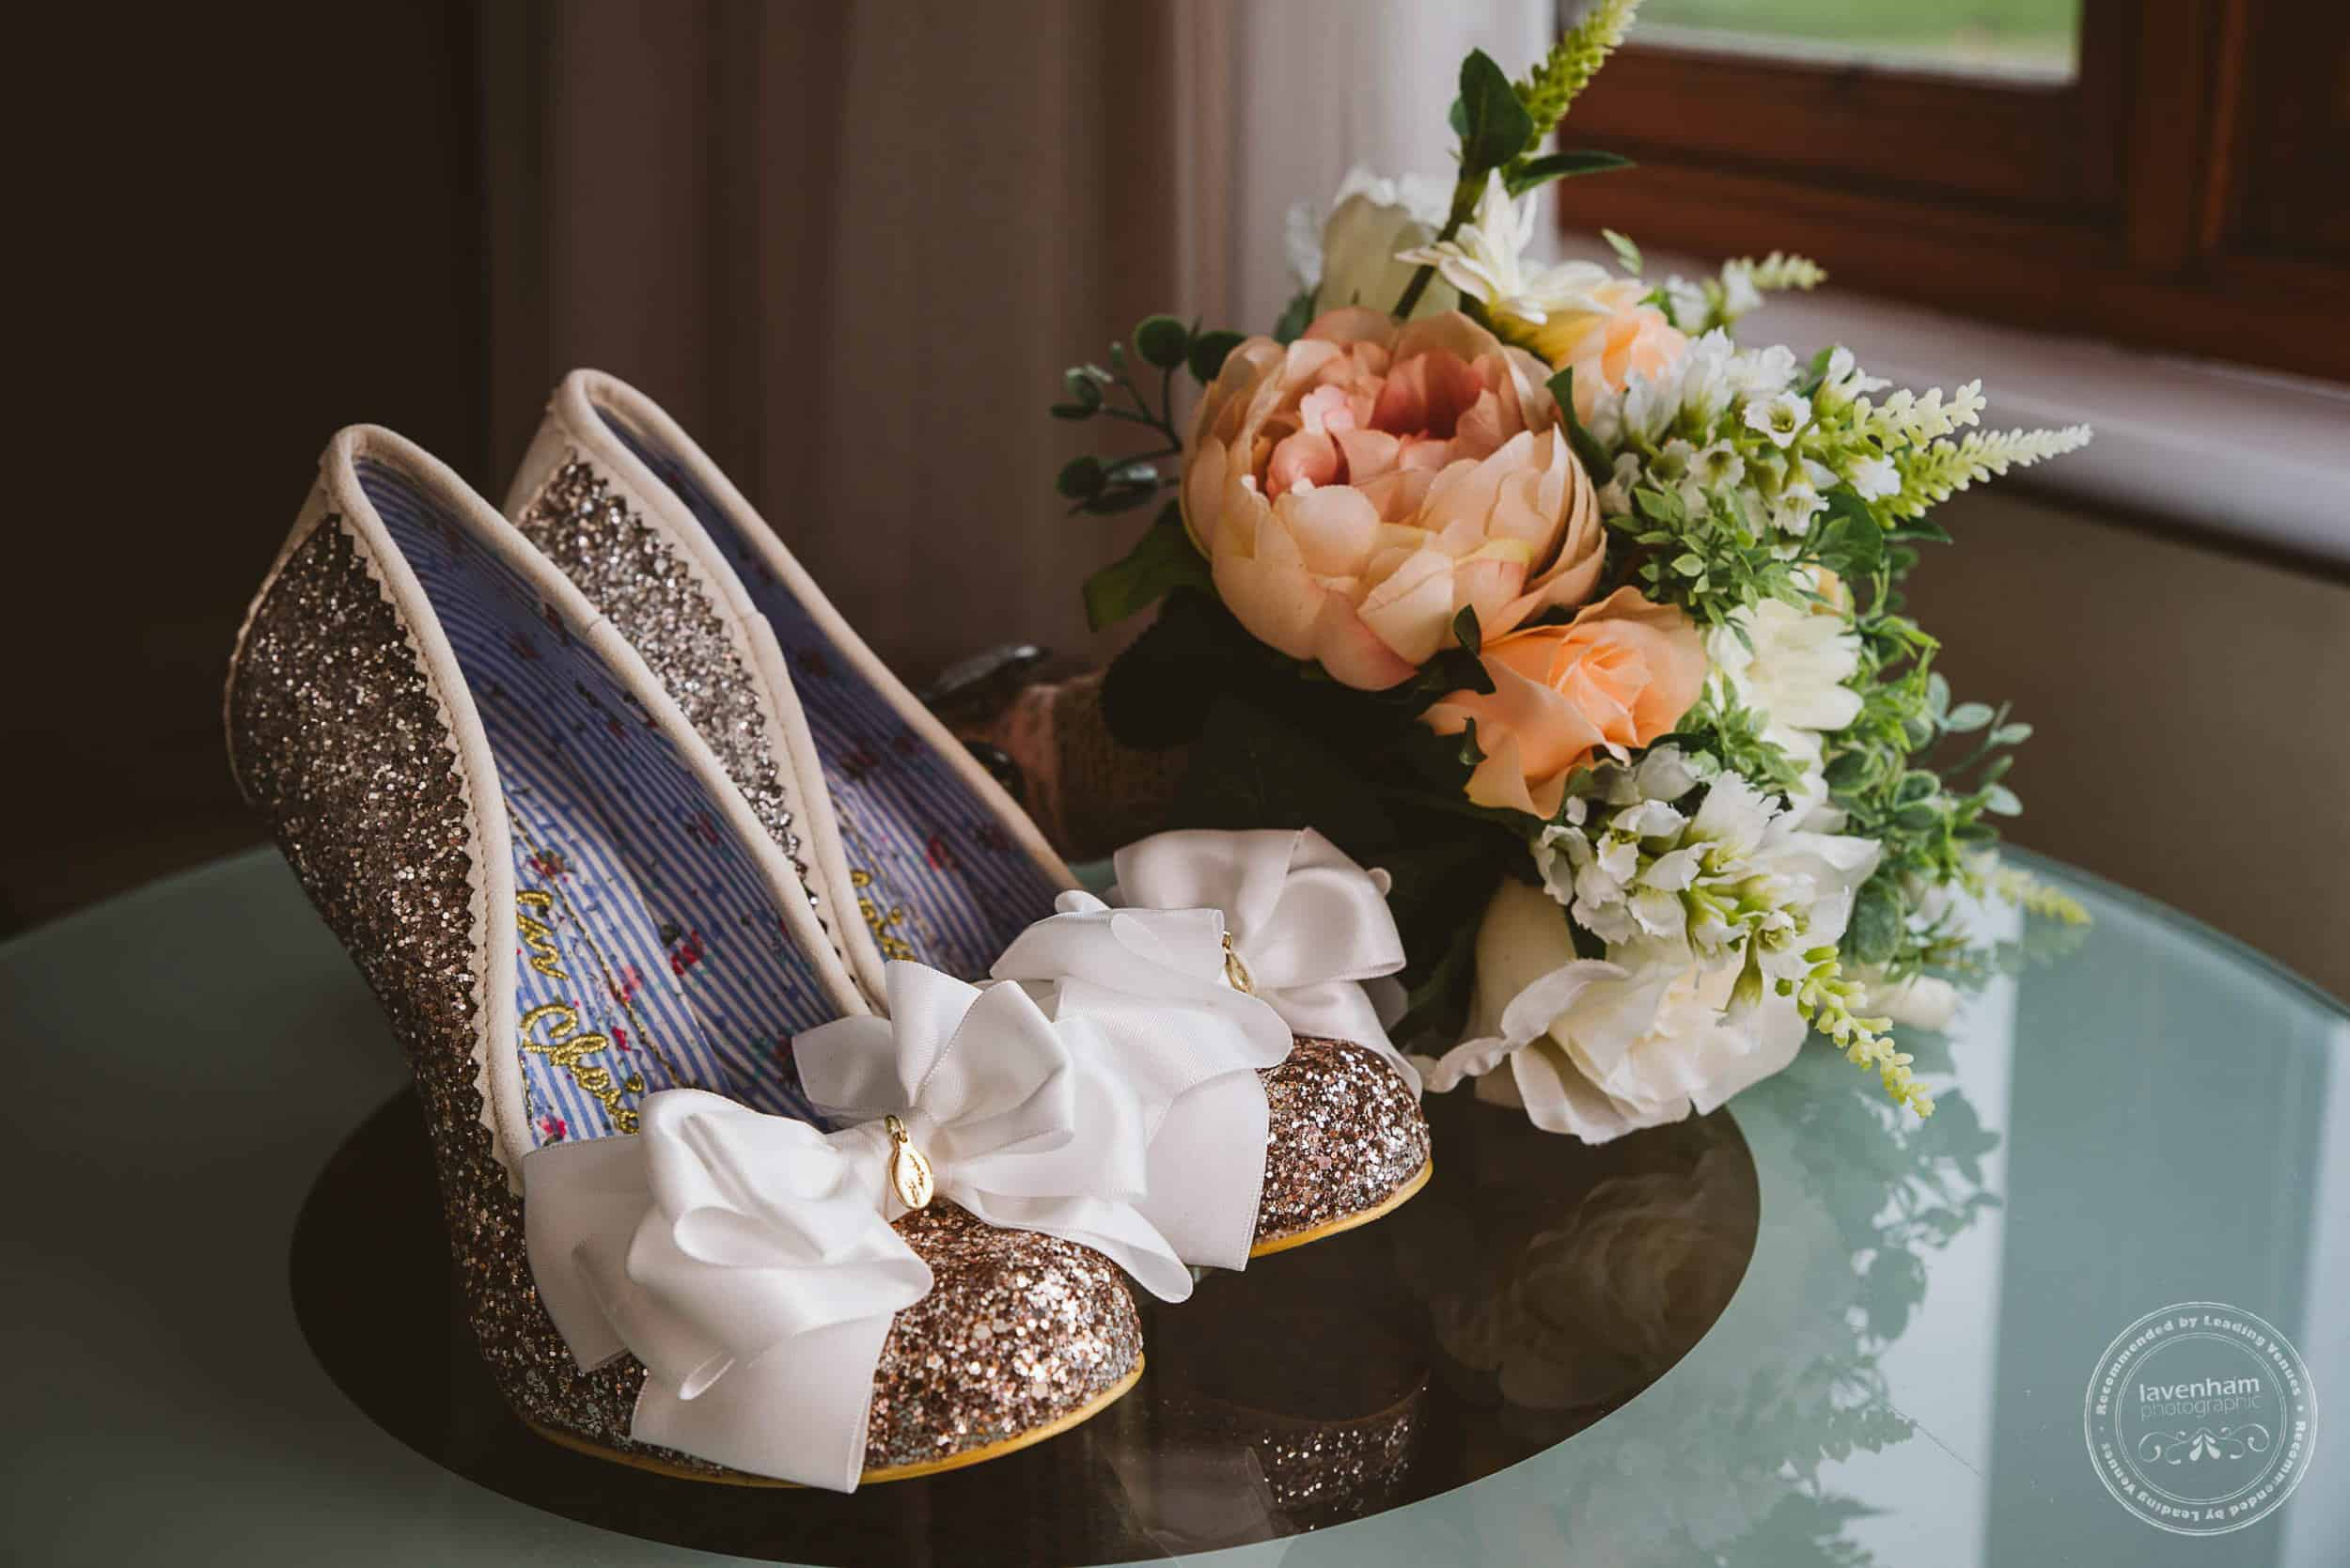 180818 Marks Hall Wedding Photography Lavenham Photographic 005